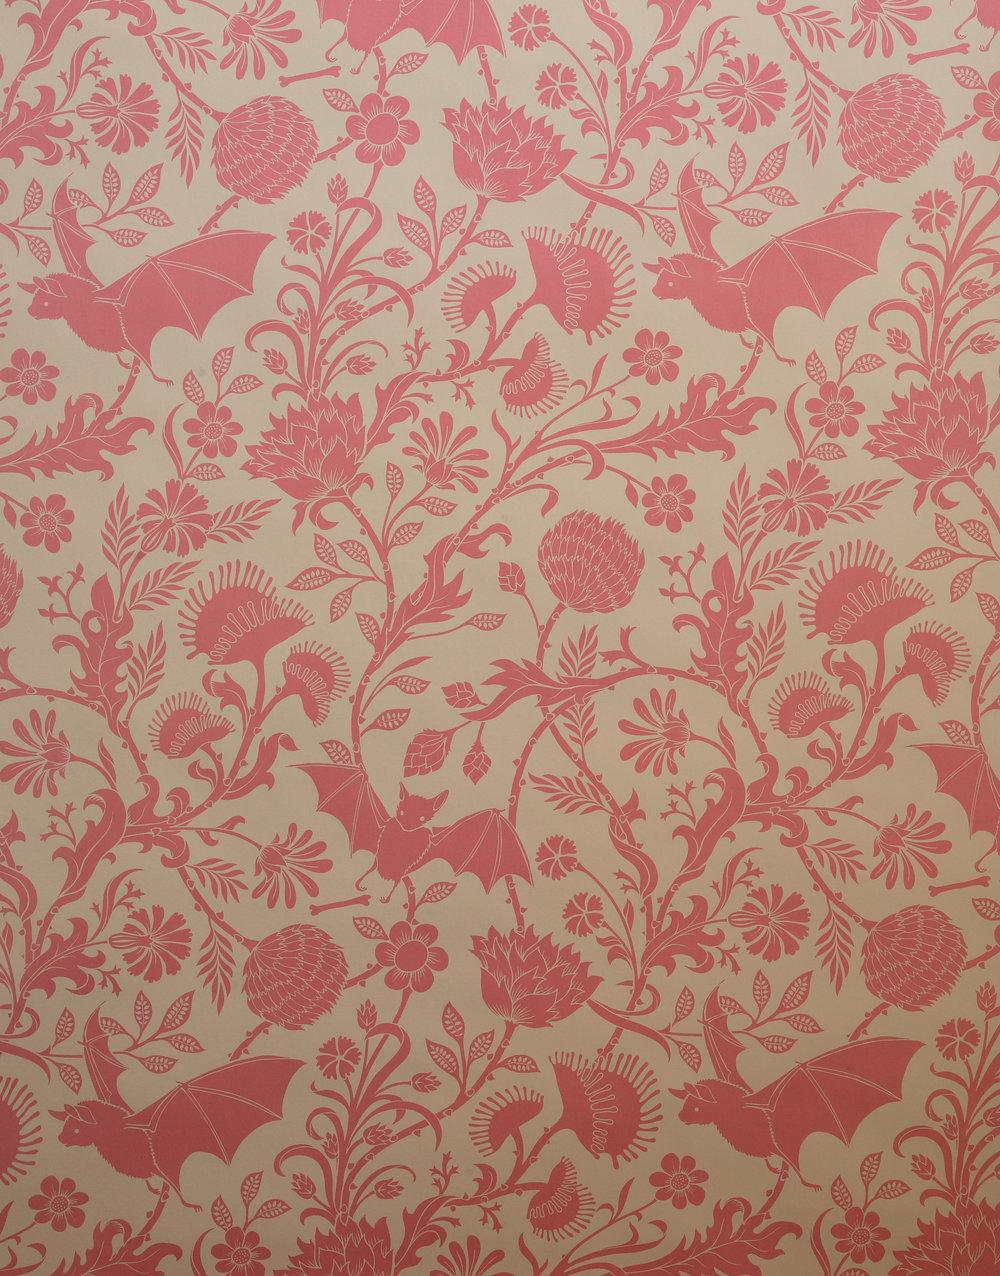 Elysian Fields Antique Pink.jpg